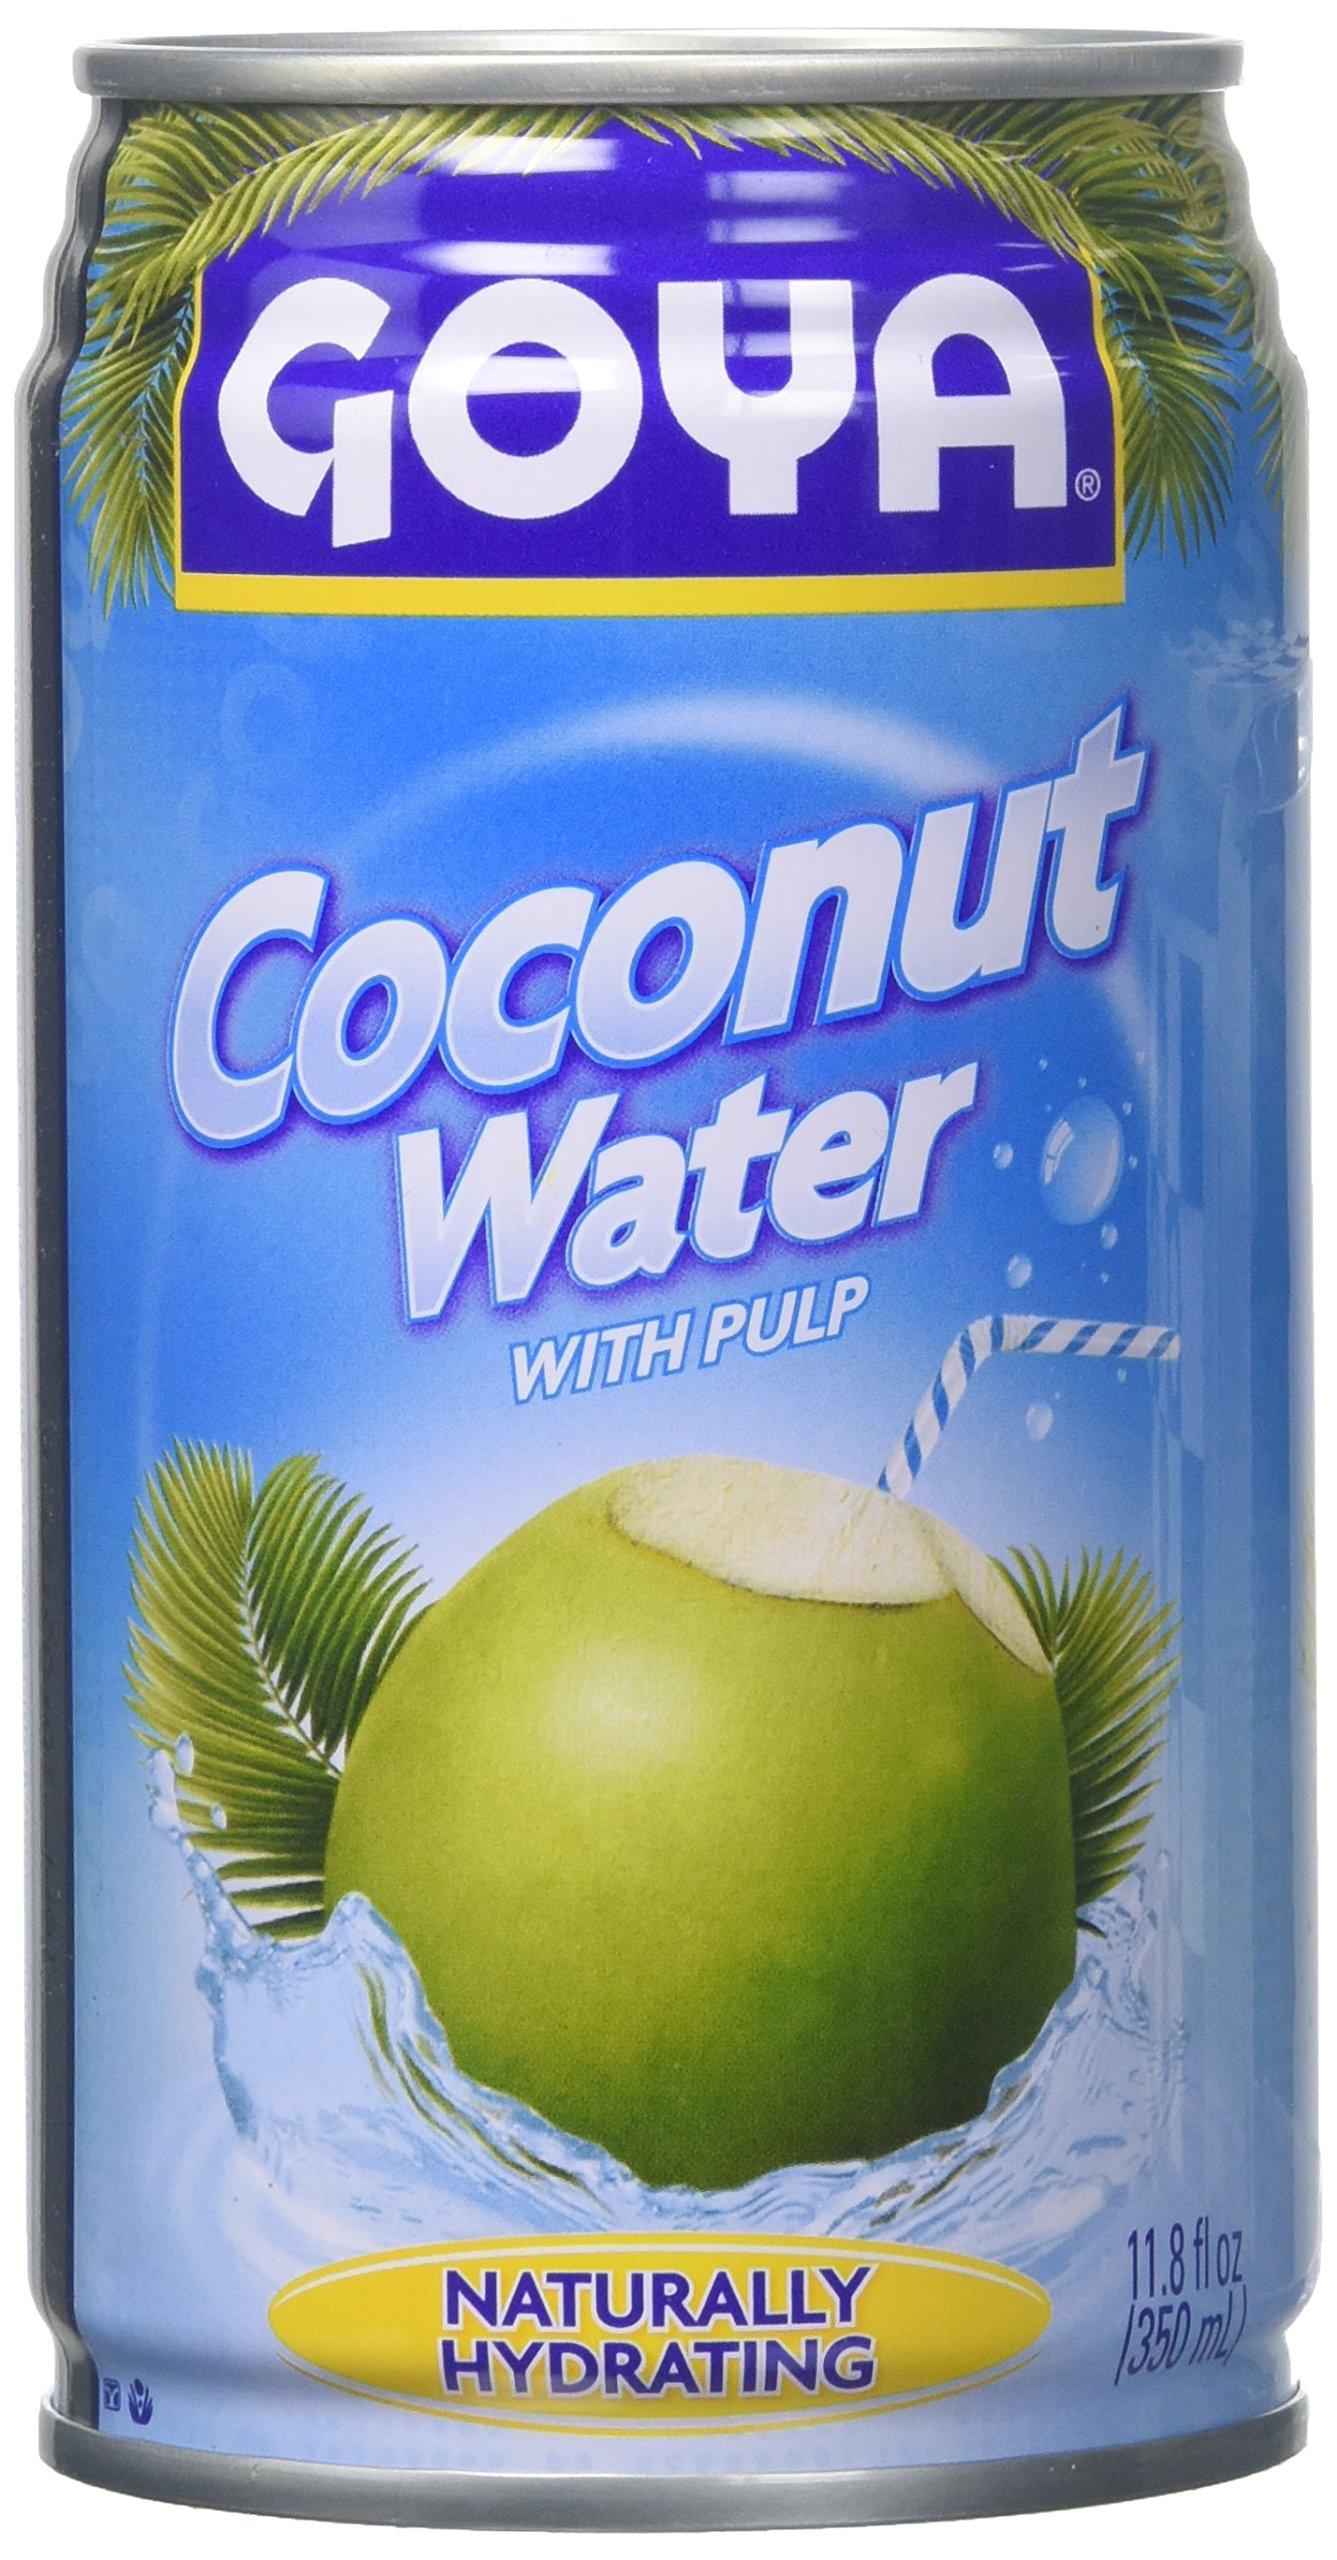 Goya Coconut Water, 11.8 oz